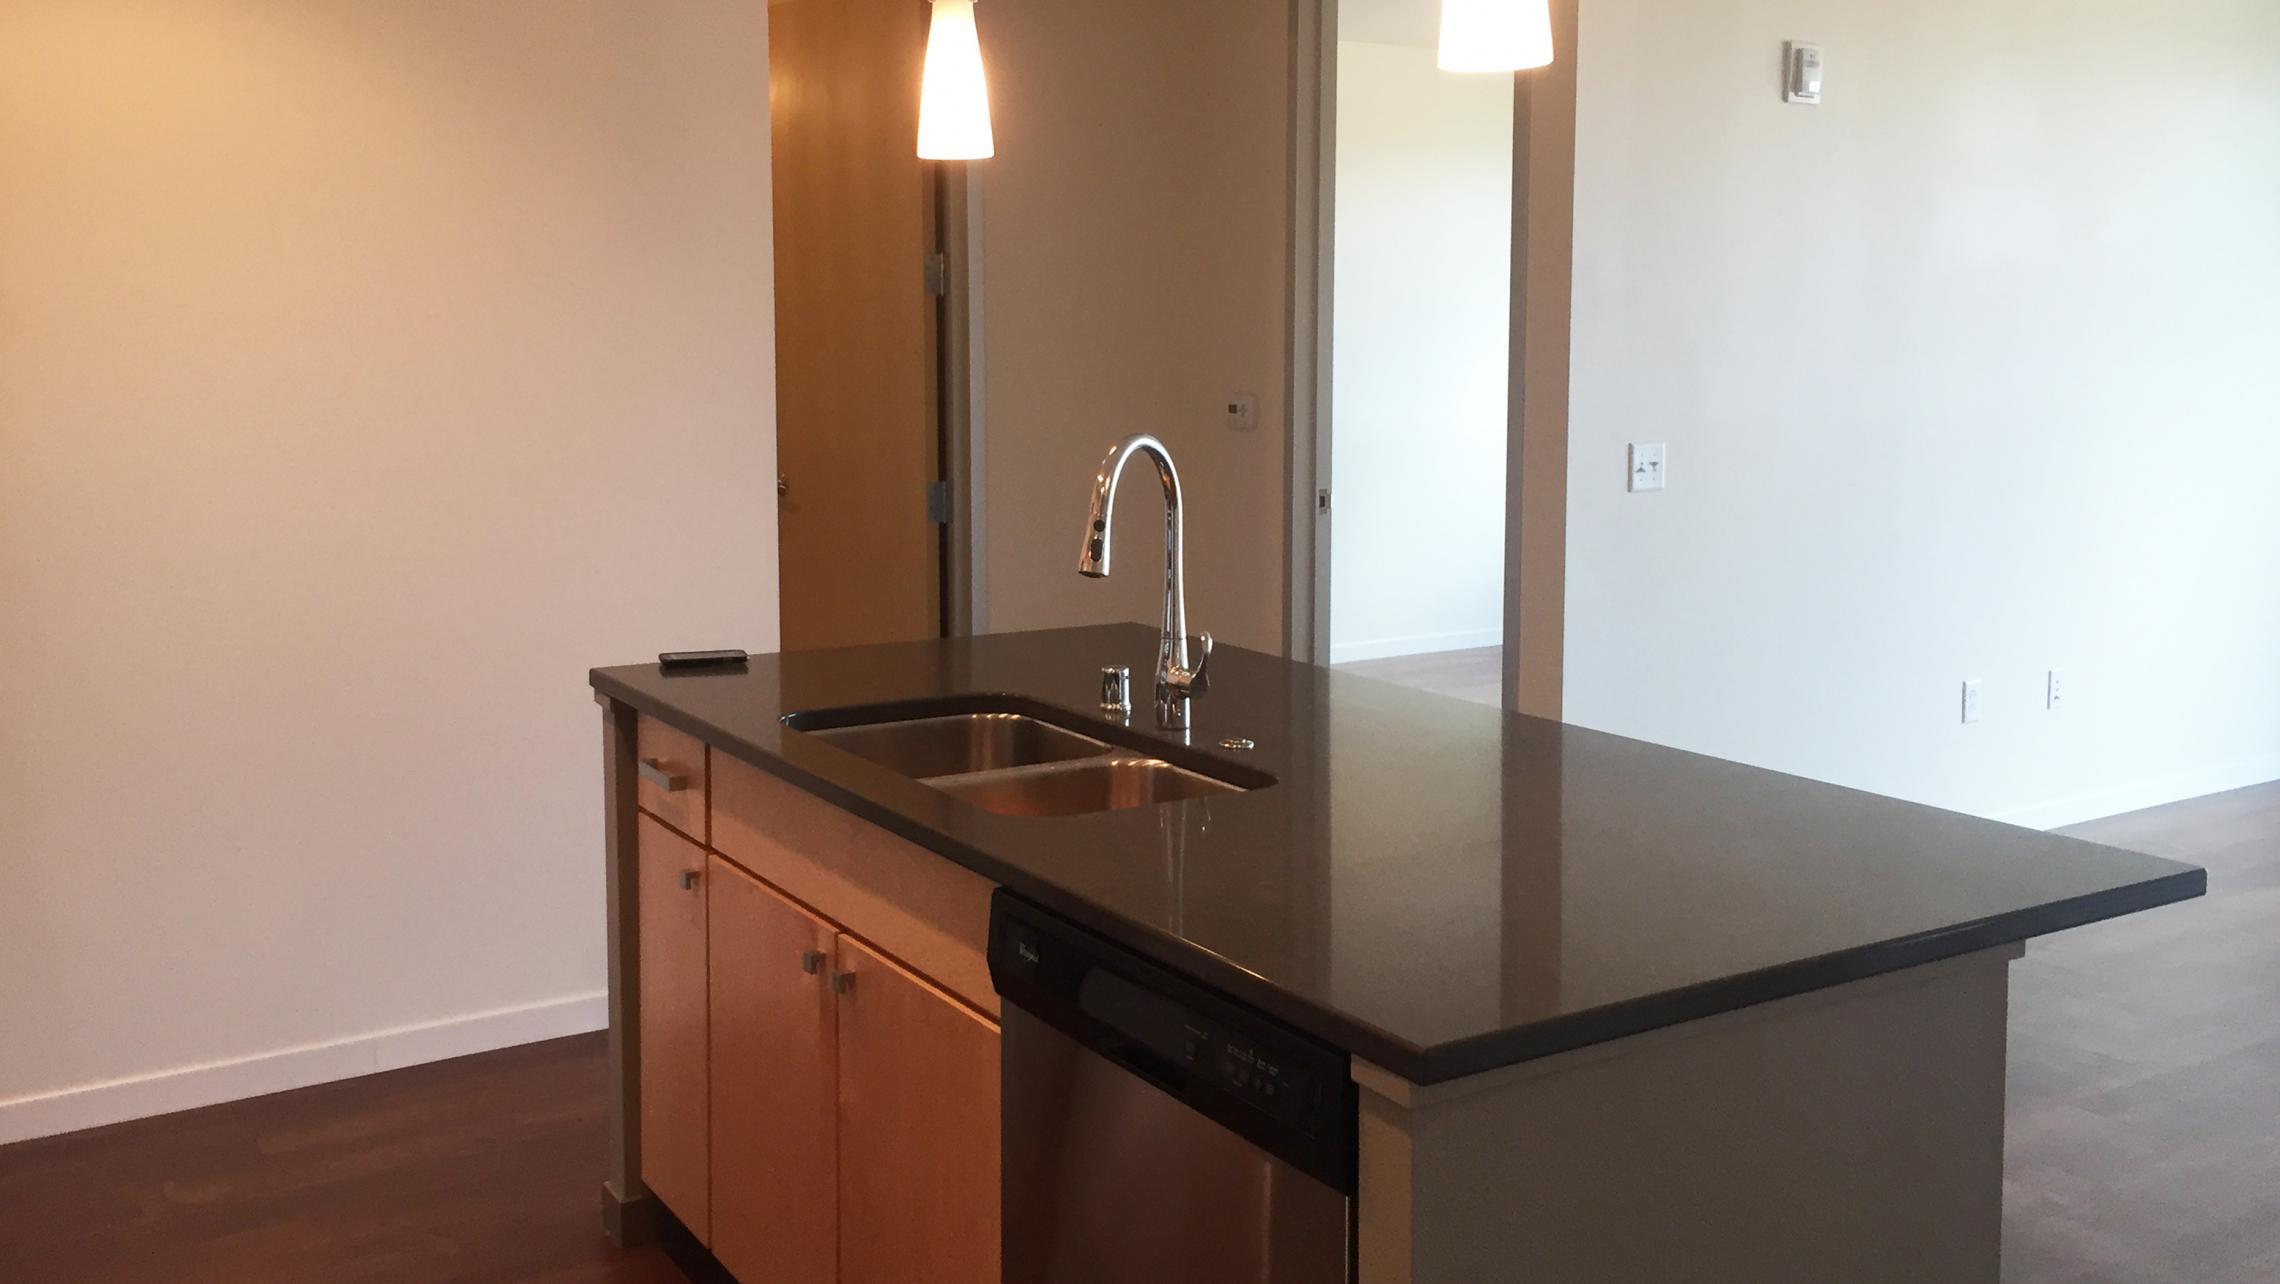 ULI Nine Line Apartment 322 - Kitchen Island